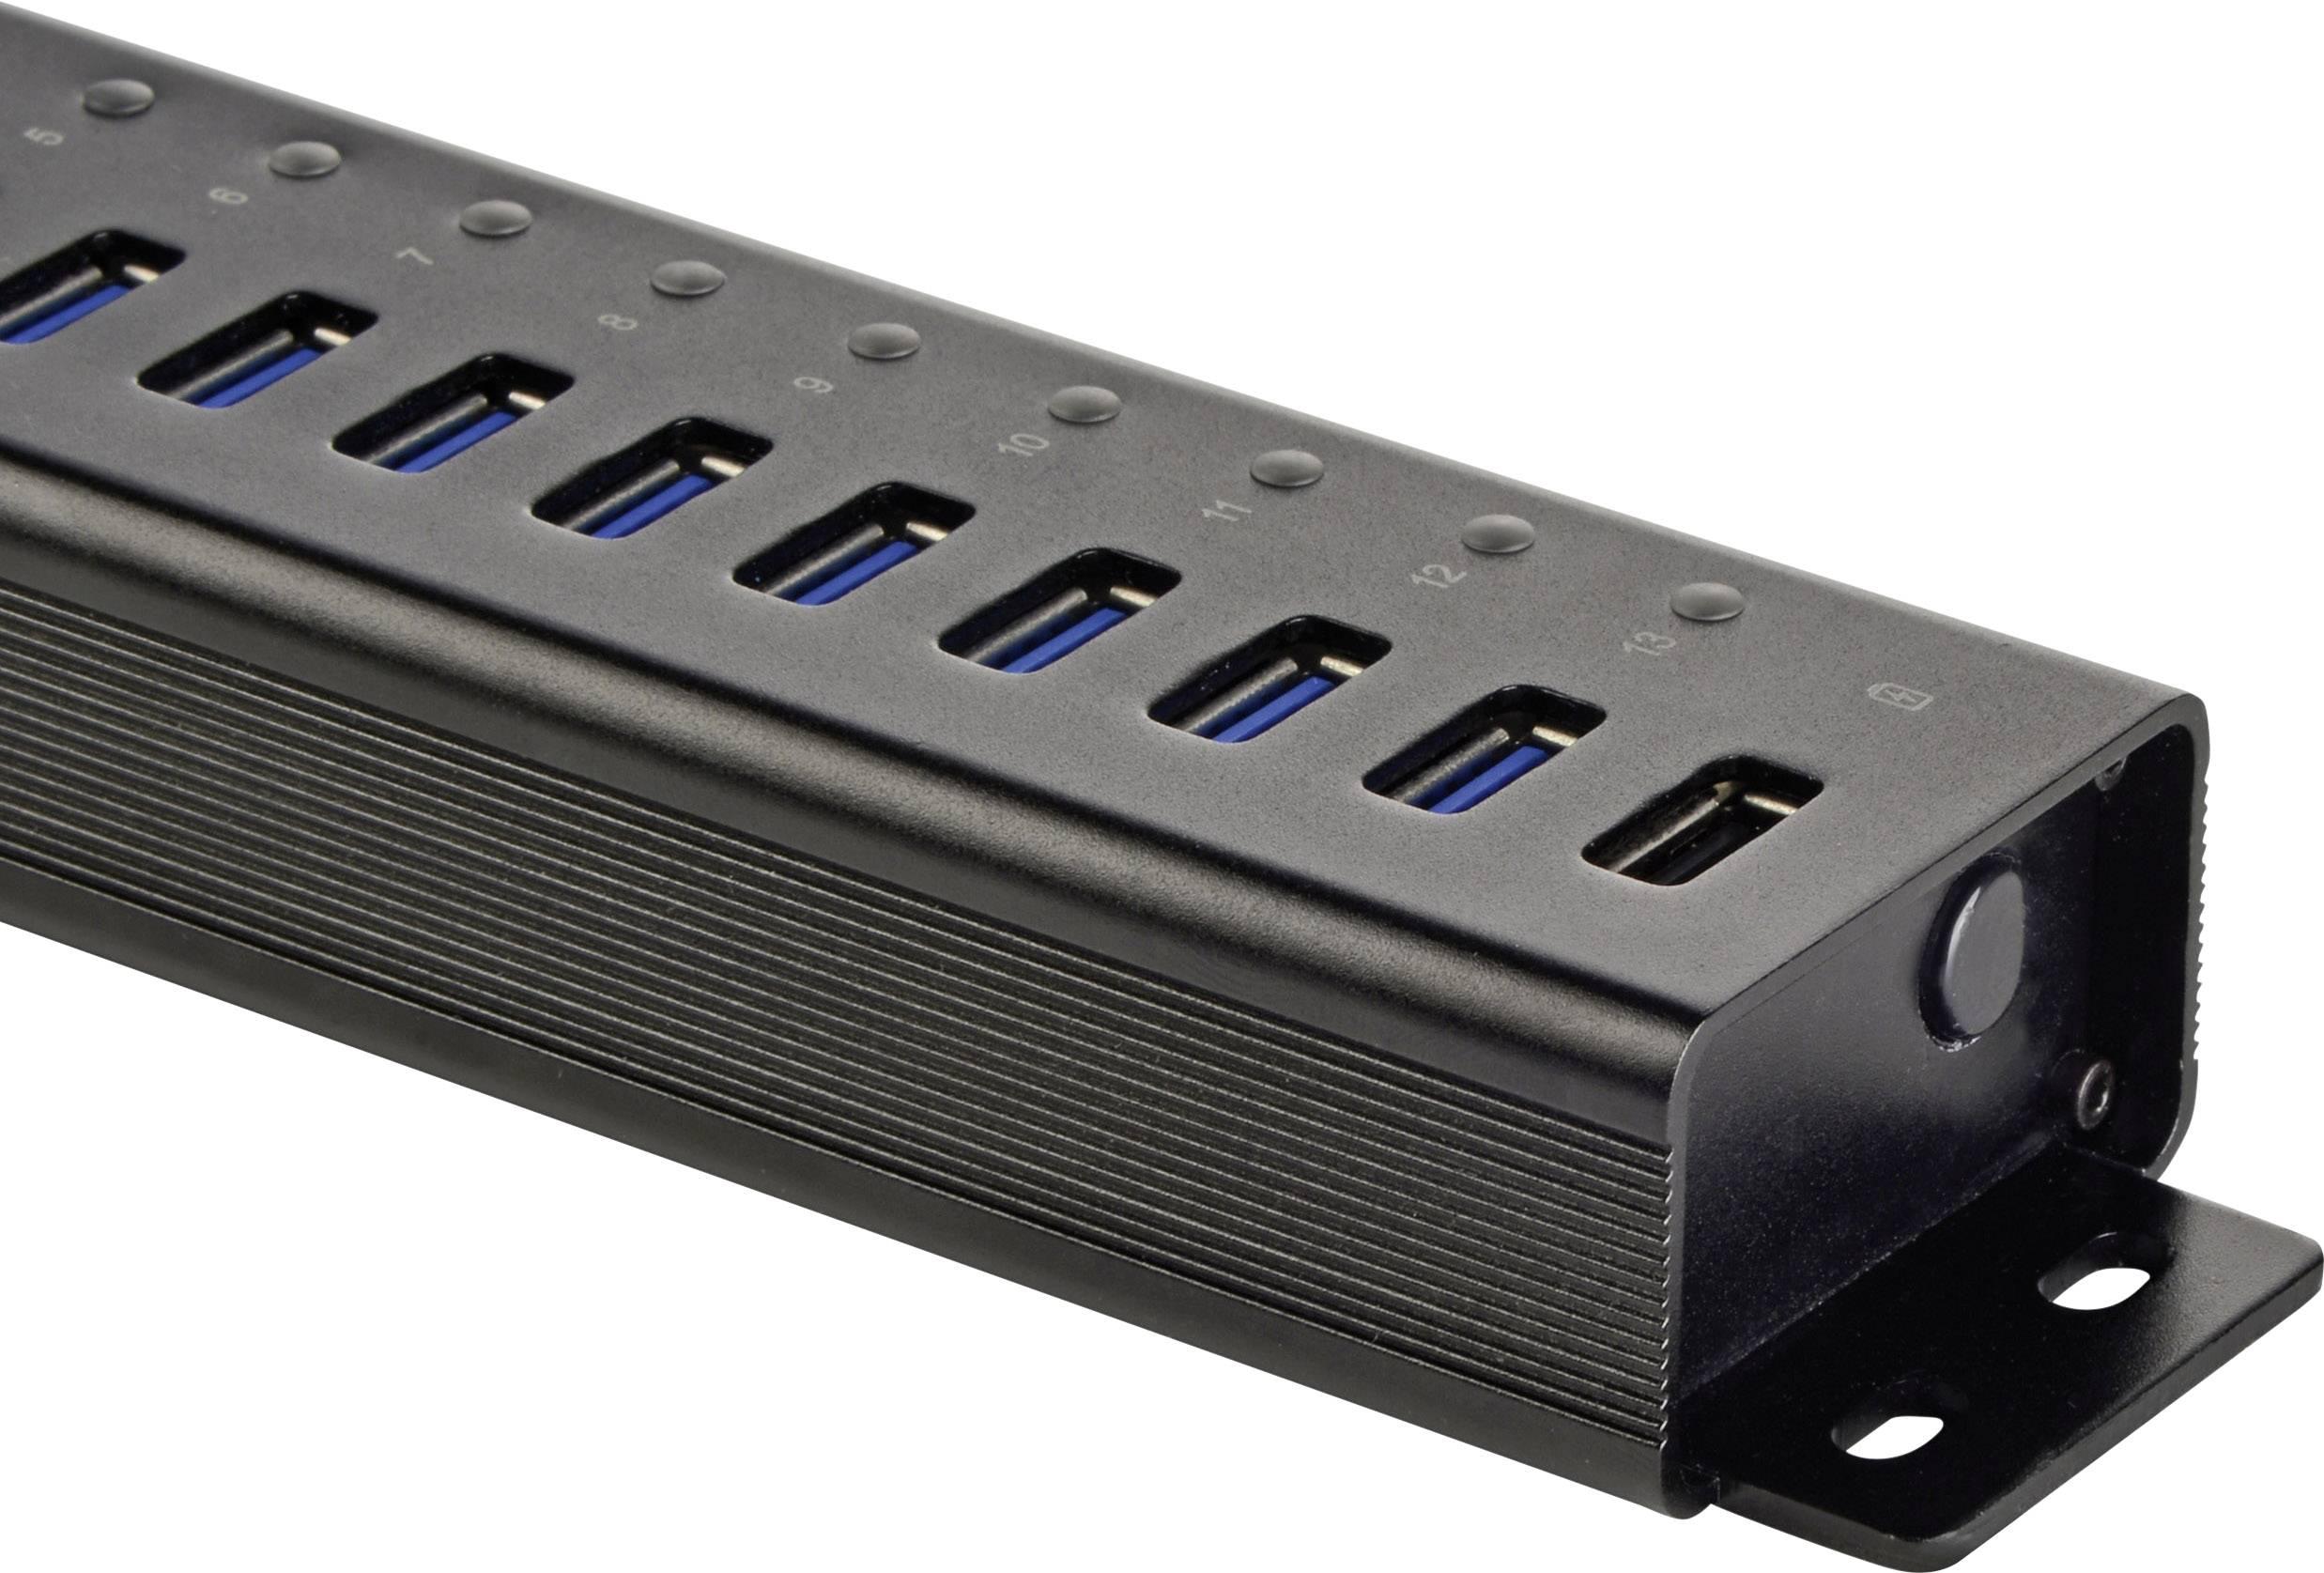 13 1 ports usb 3 0 hubaluminium casing wall mount option quick charge portrenkforce. Black Bedroom Furniture Sets. Home Design Ideas